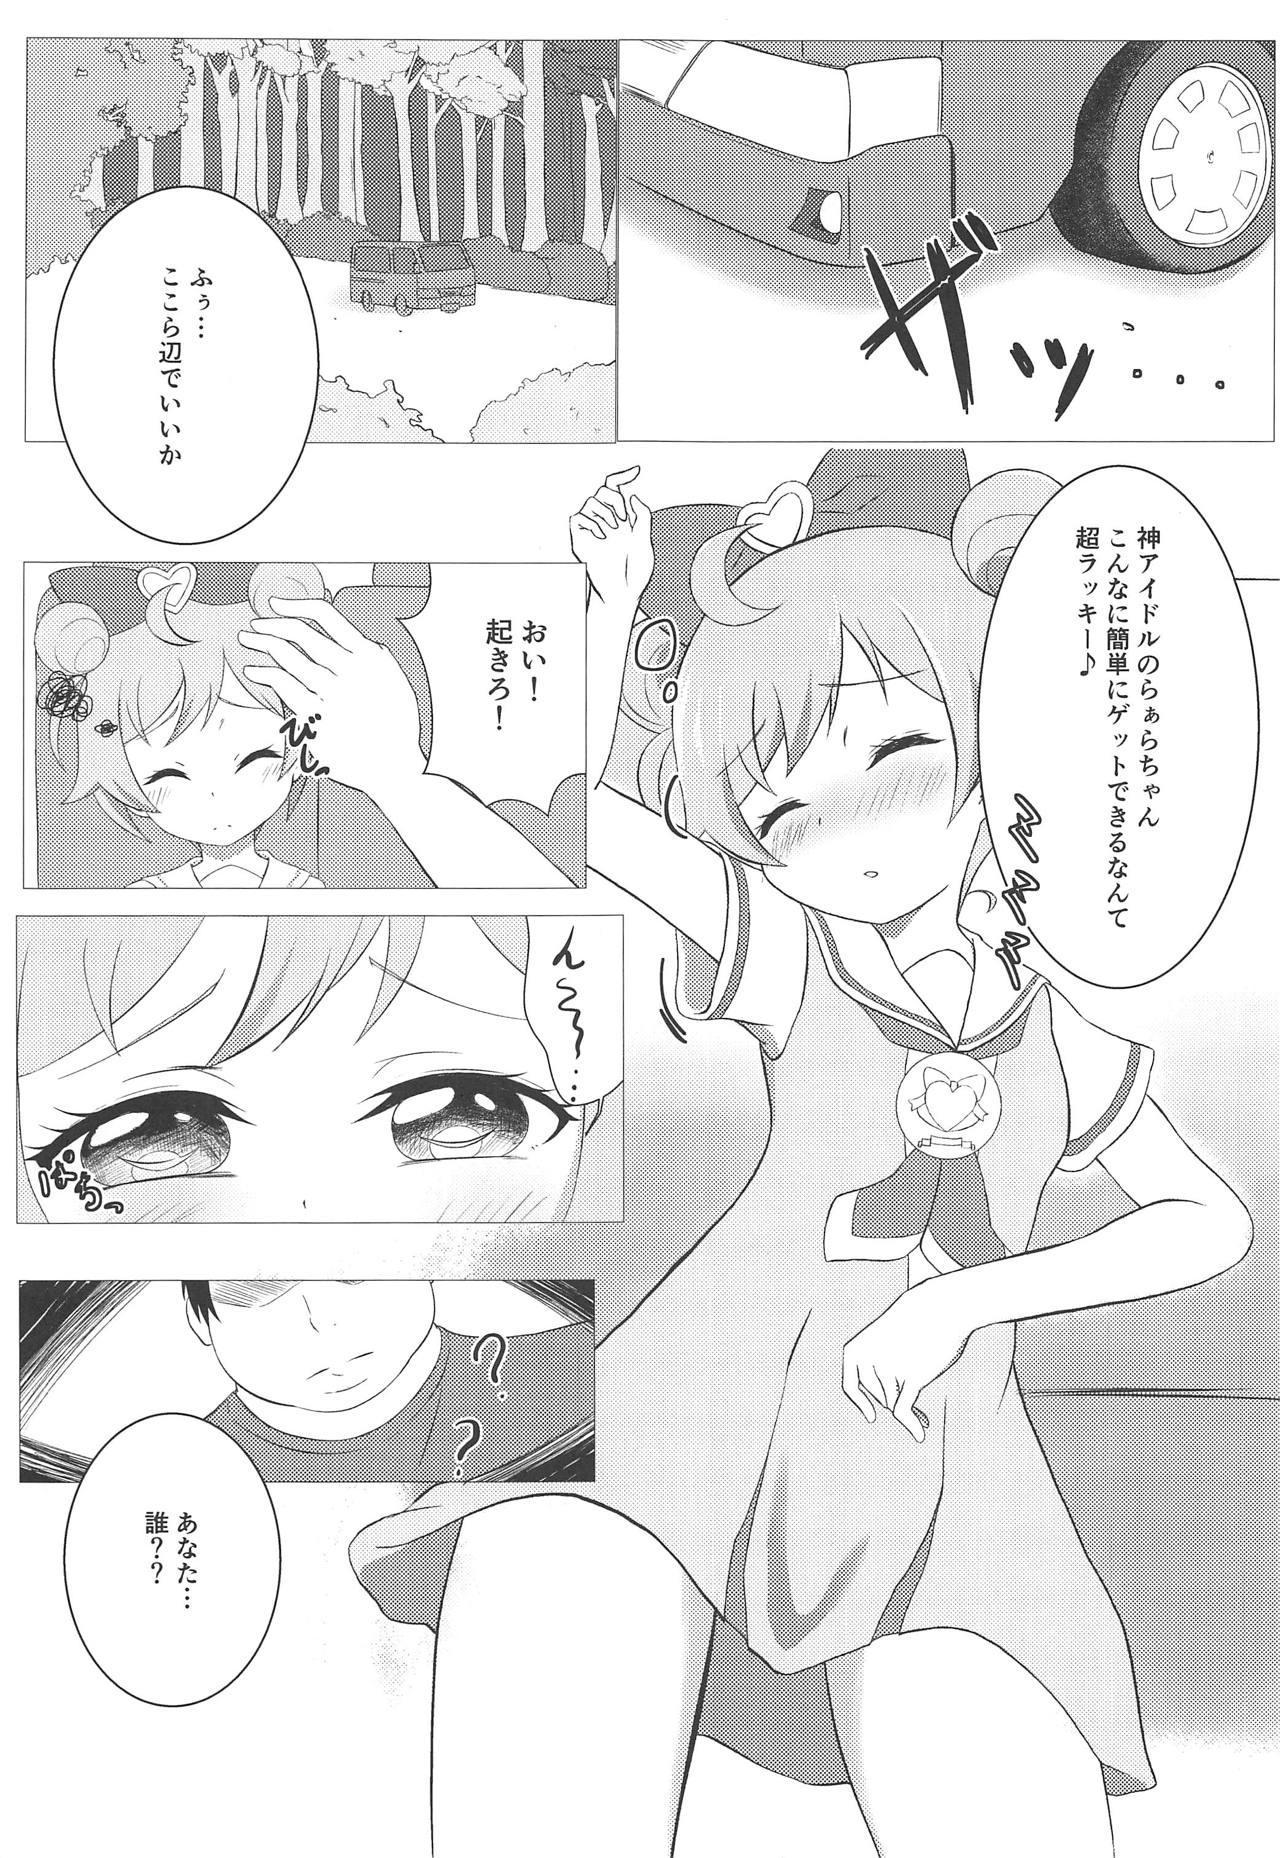 Kami Idol Rachitte Mita! 1